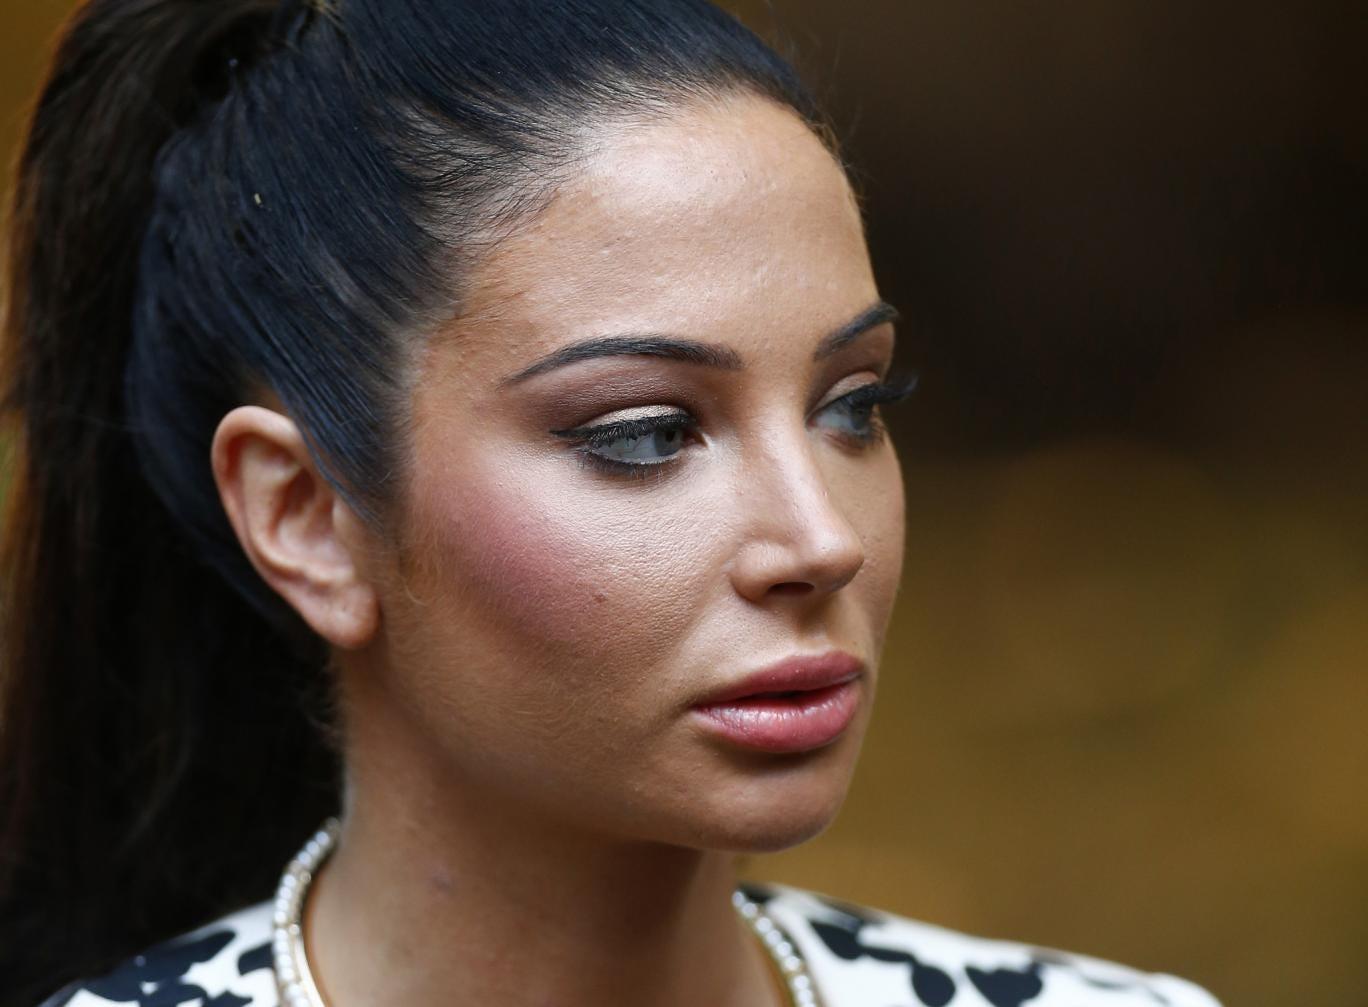 Tulisa Contostavlos admits to having cosmetic surgery